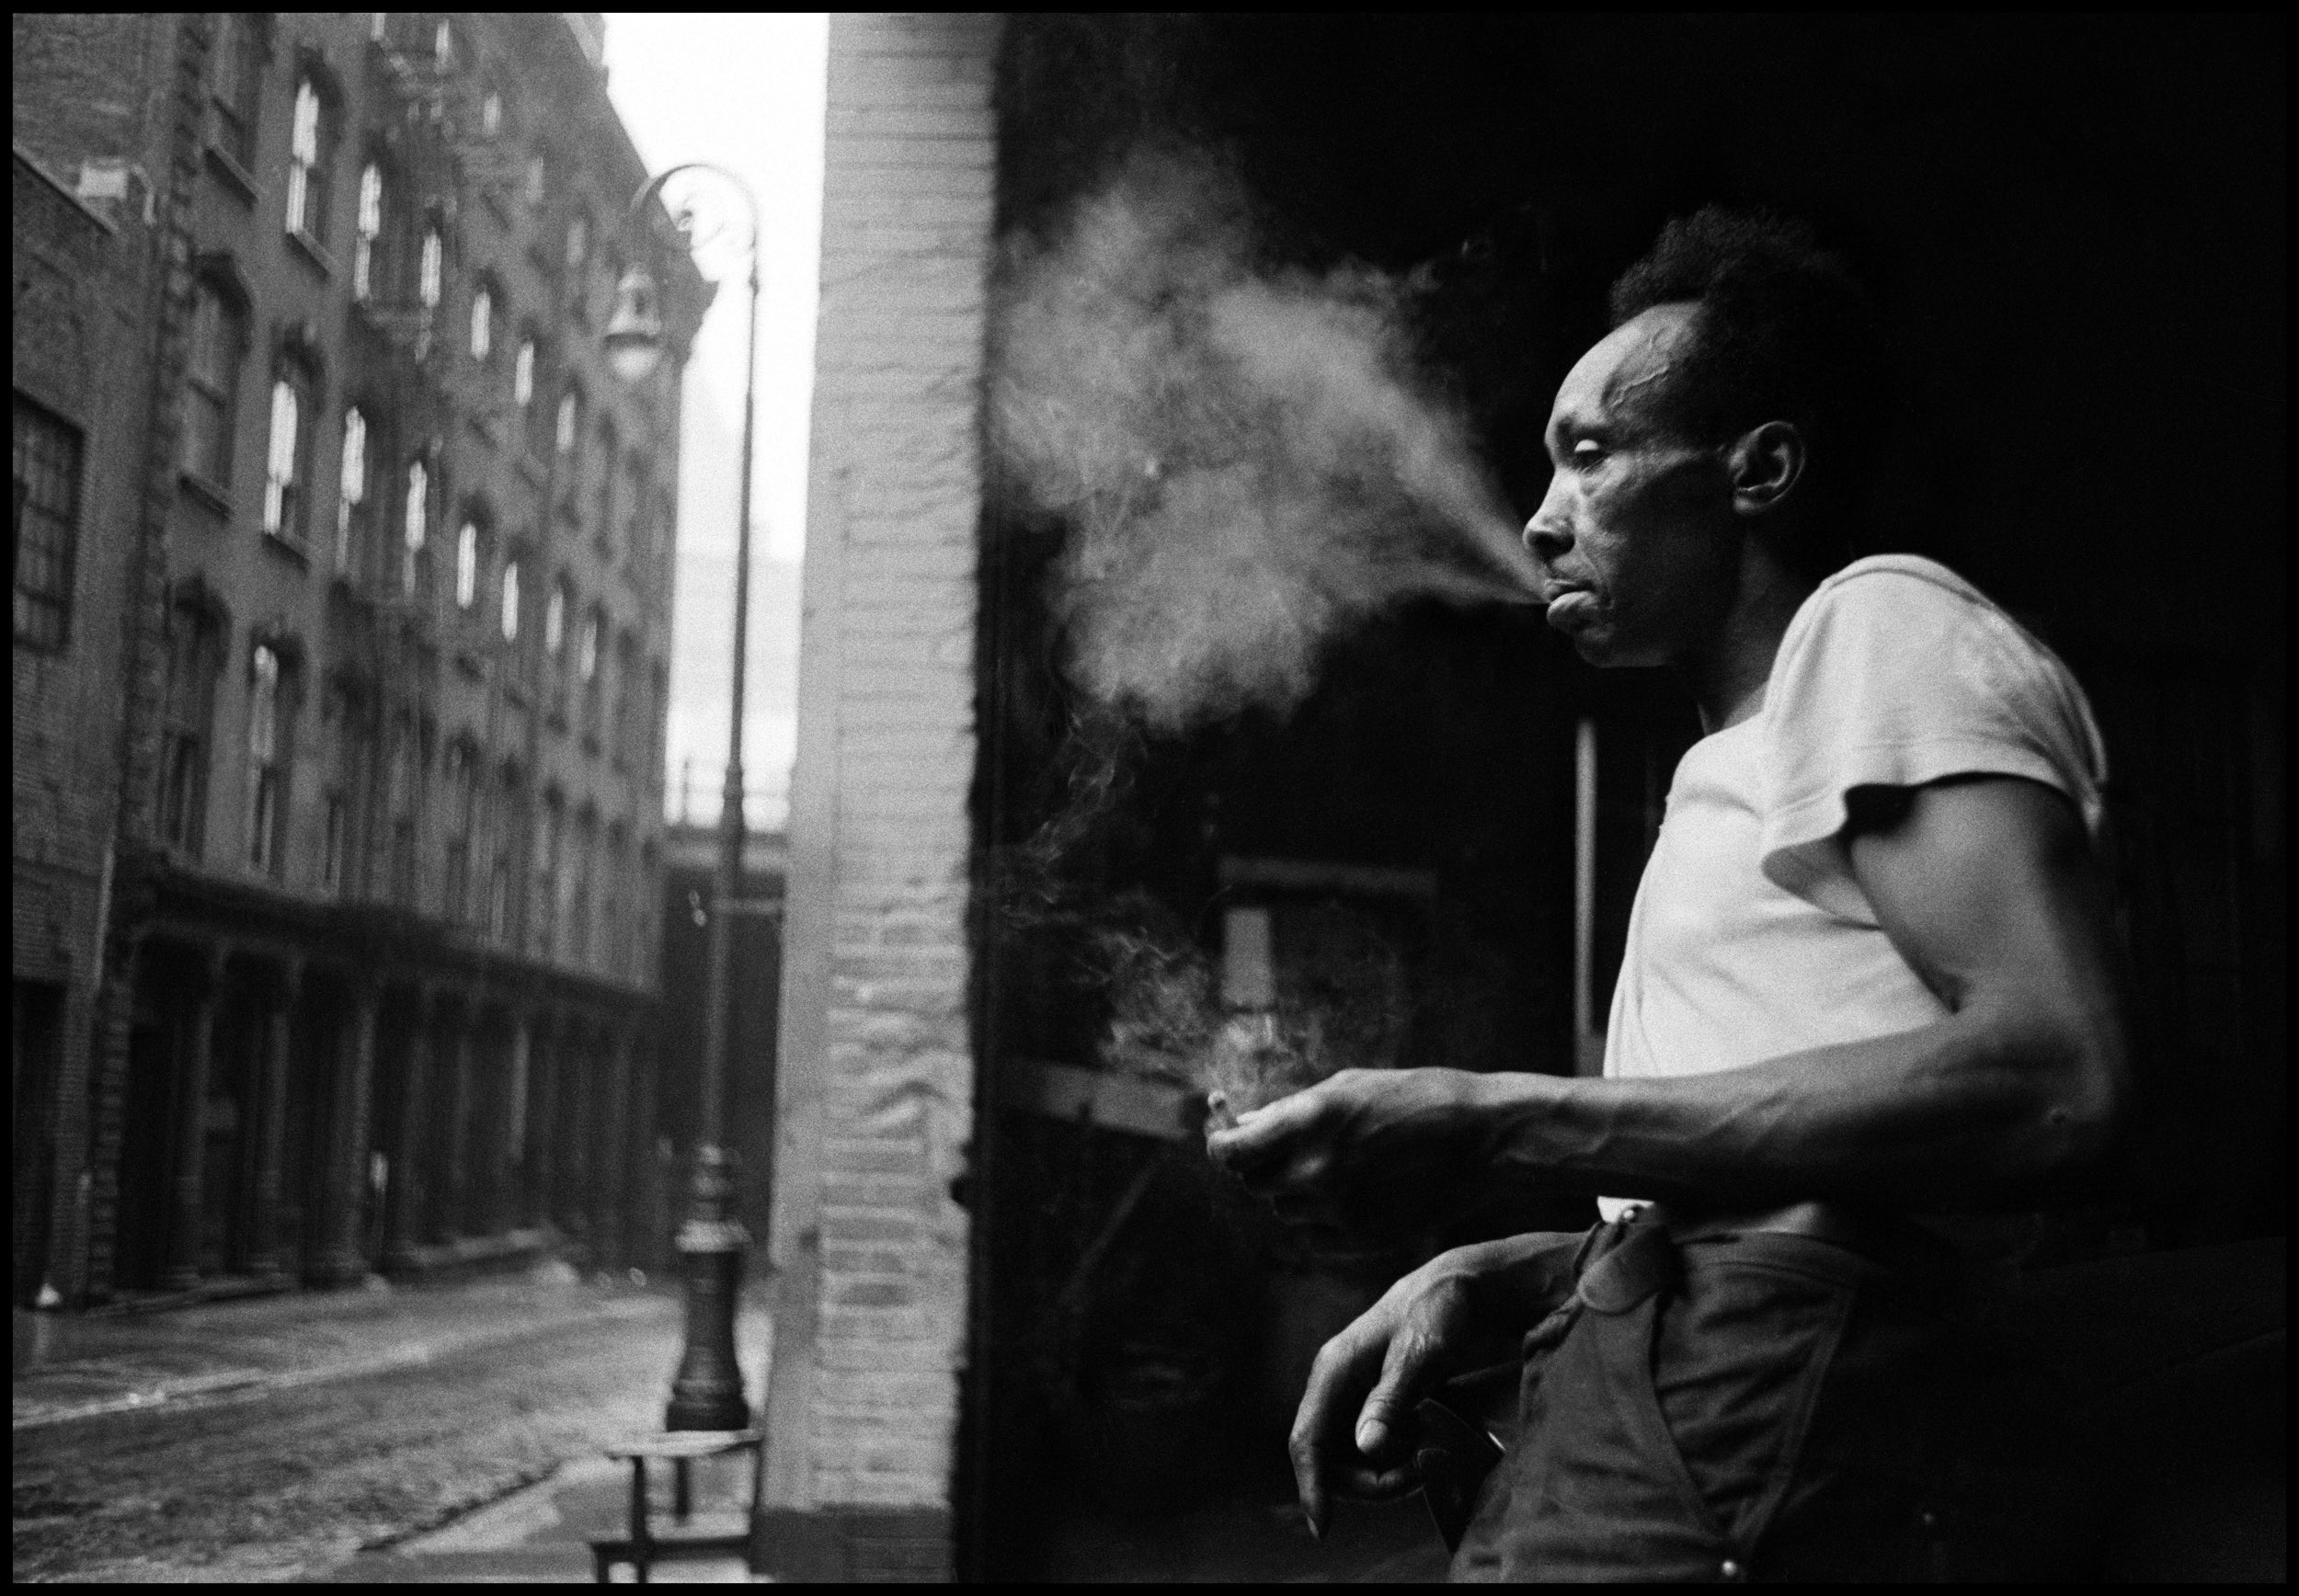 USA. New York City. 1955. Man smoking in the streets under the Brooklyn Bridge. Photo by Erich Hartmann.